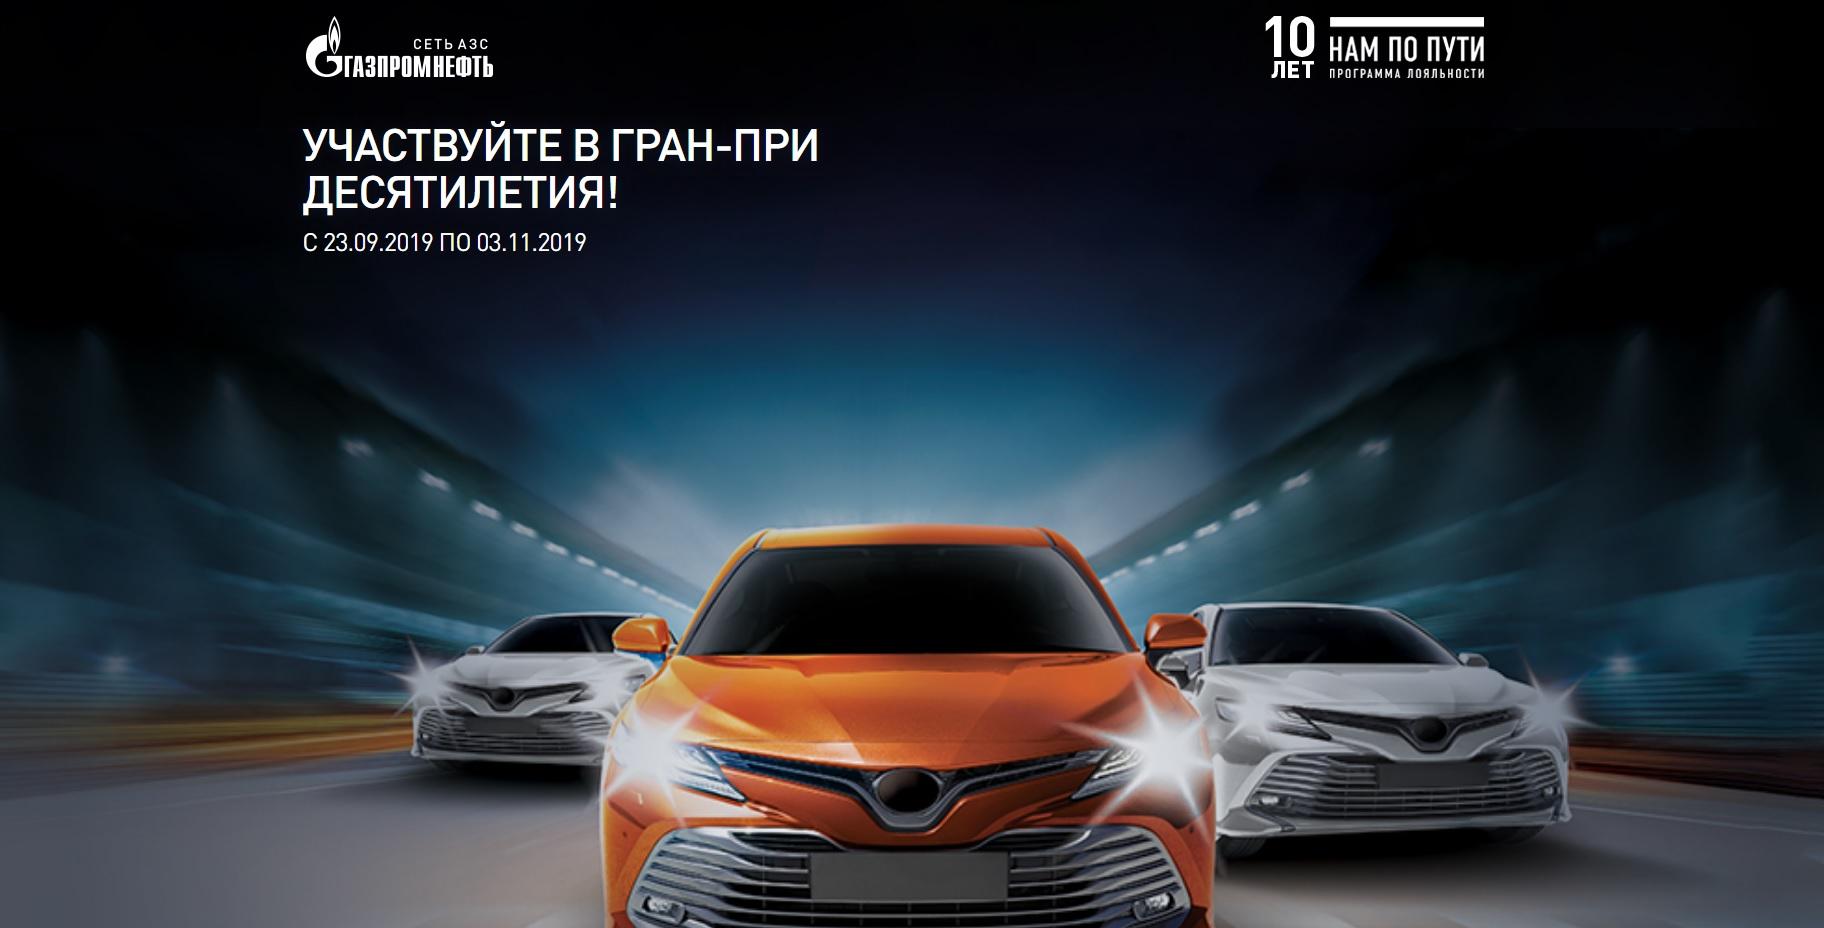 Акция «Гран-при десятилетия» от АЗС Газпромнефть